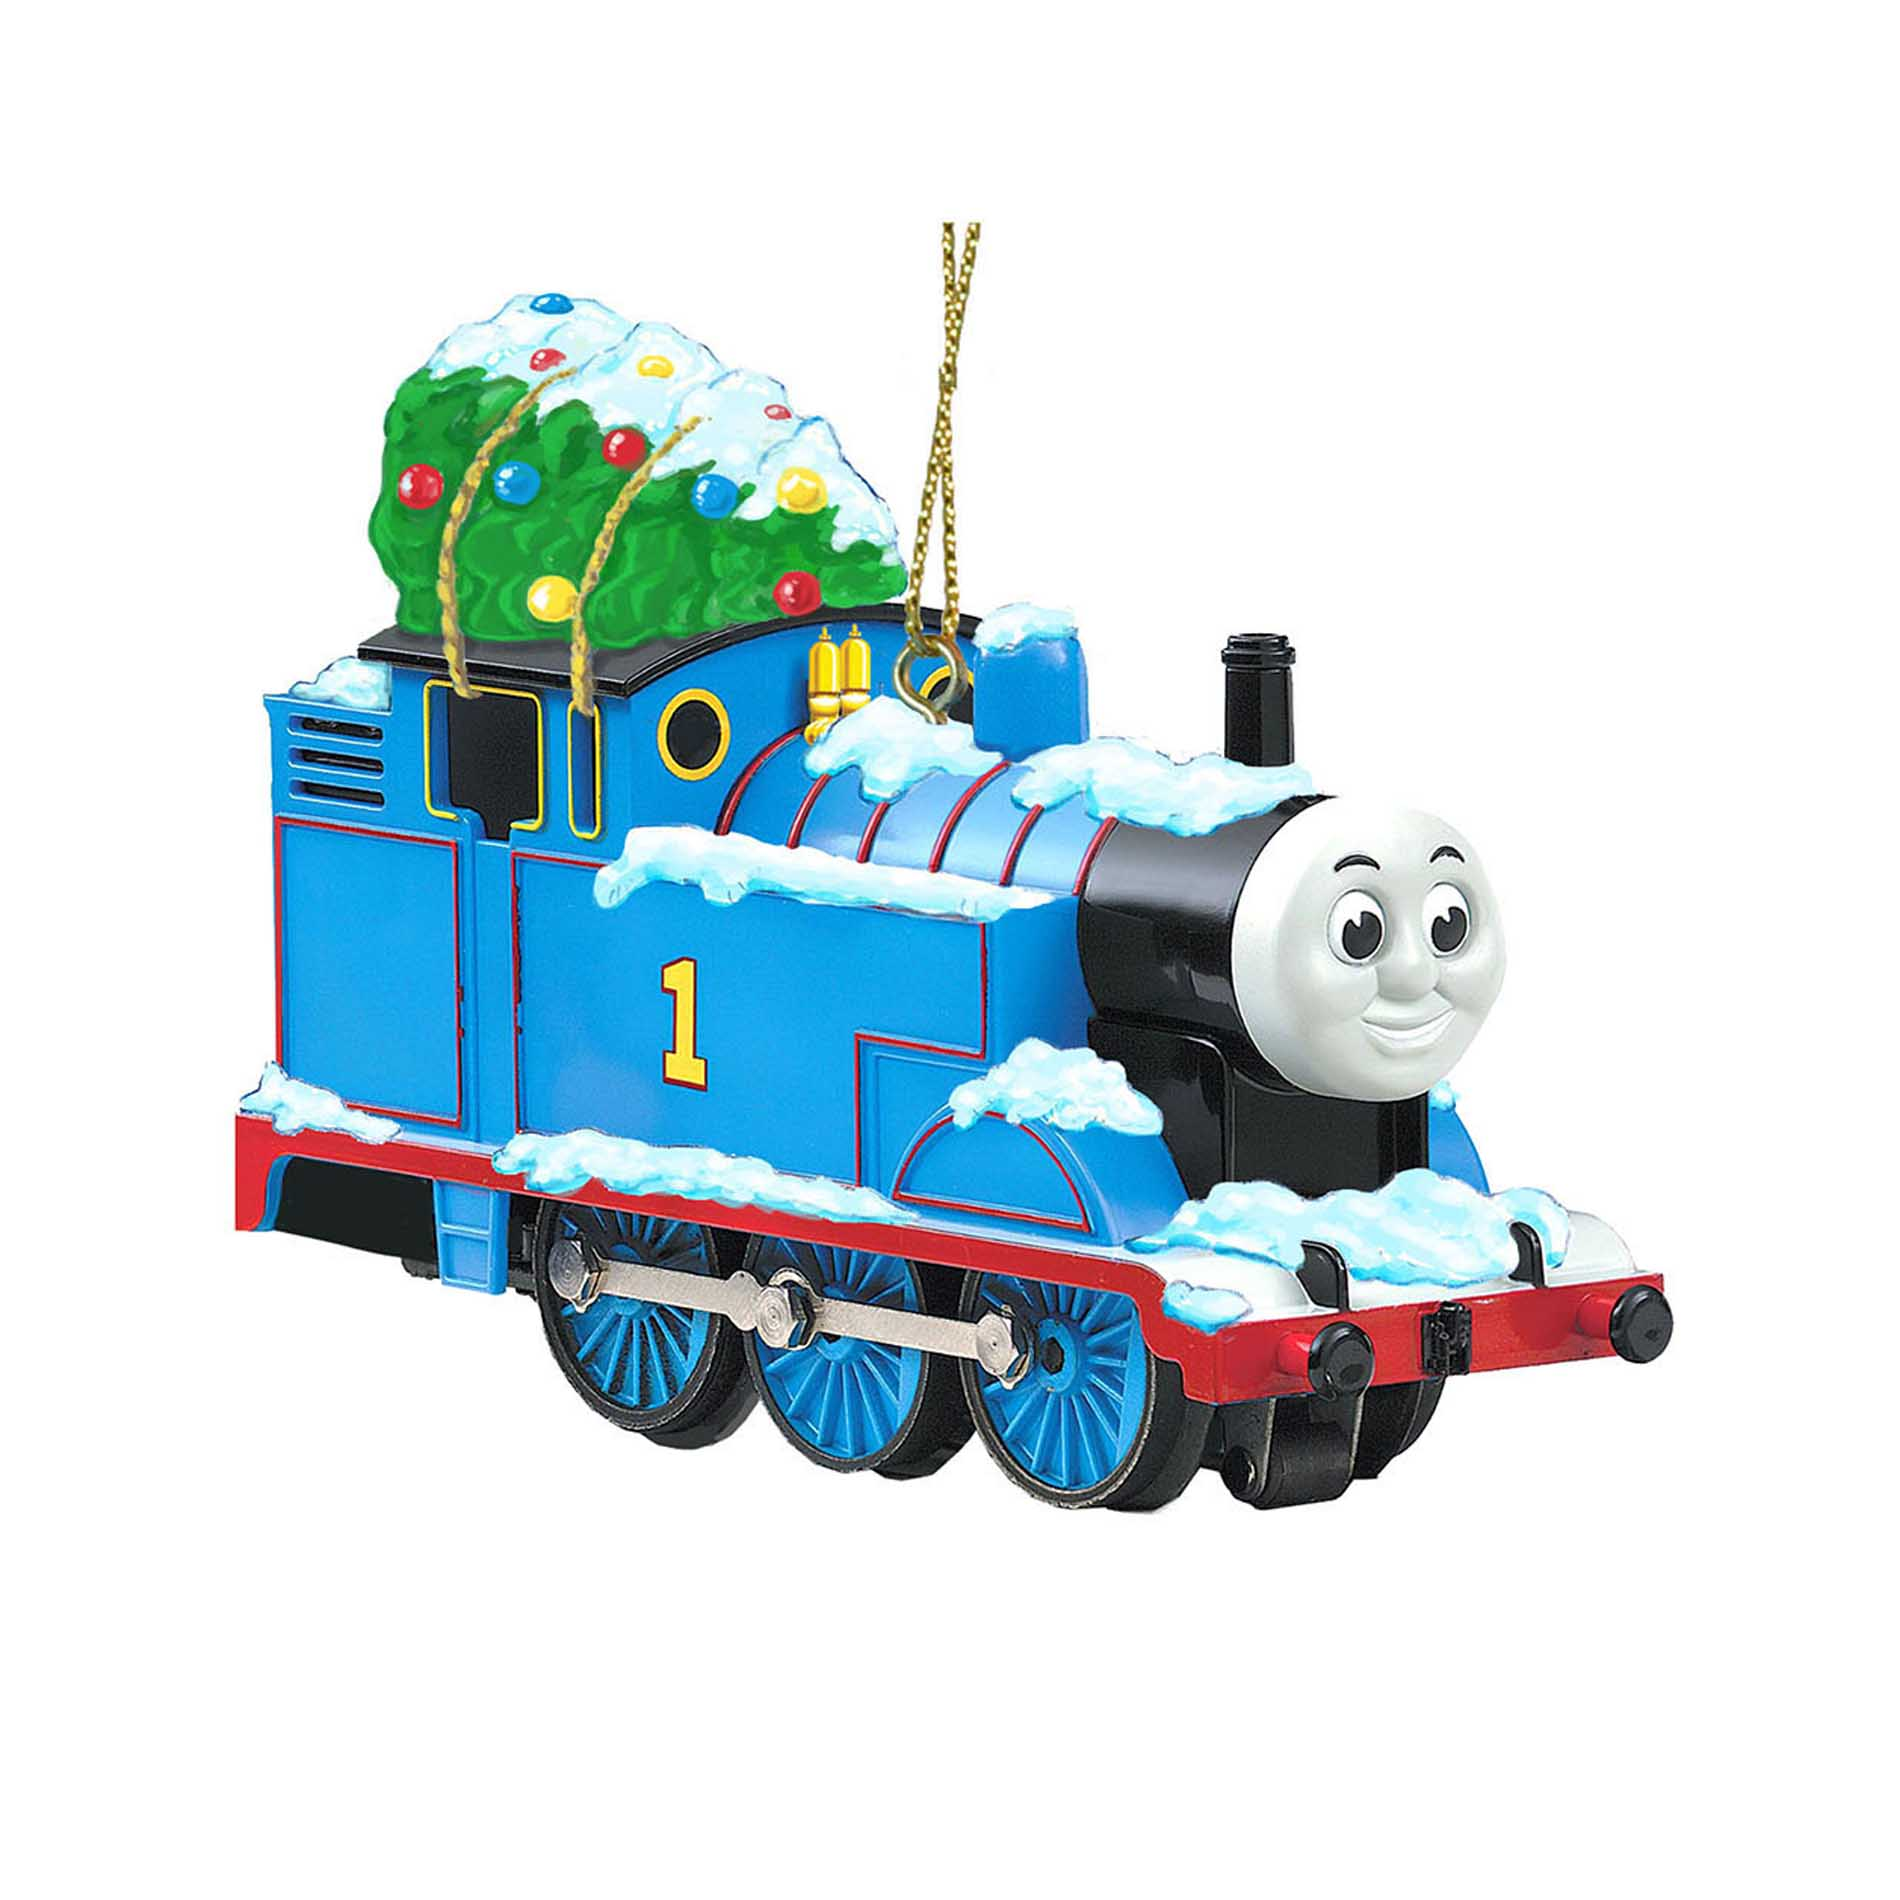 Thomas The Tank Engine Christmas Ornaments